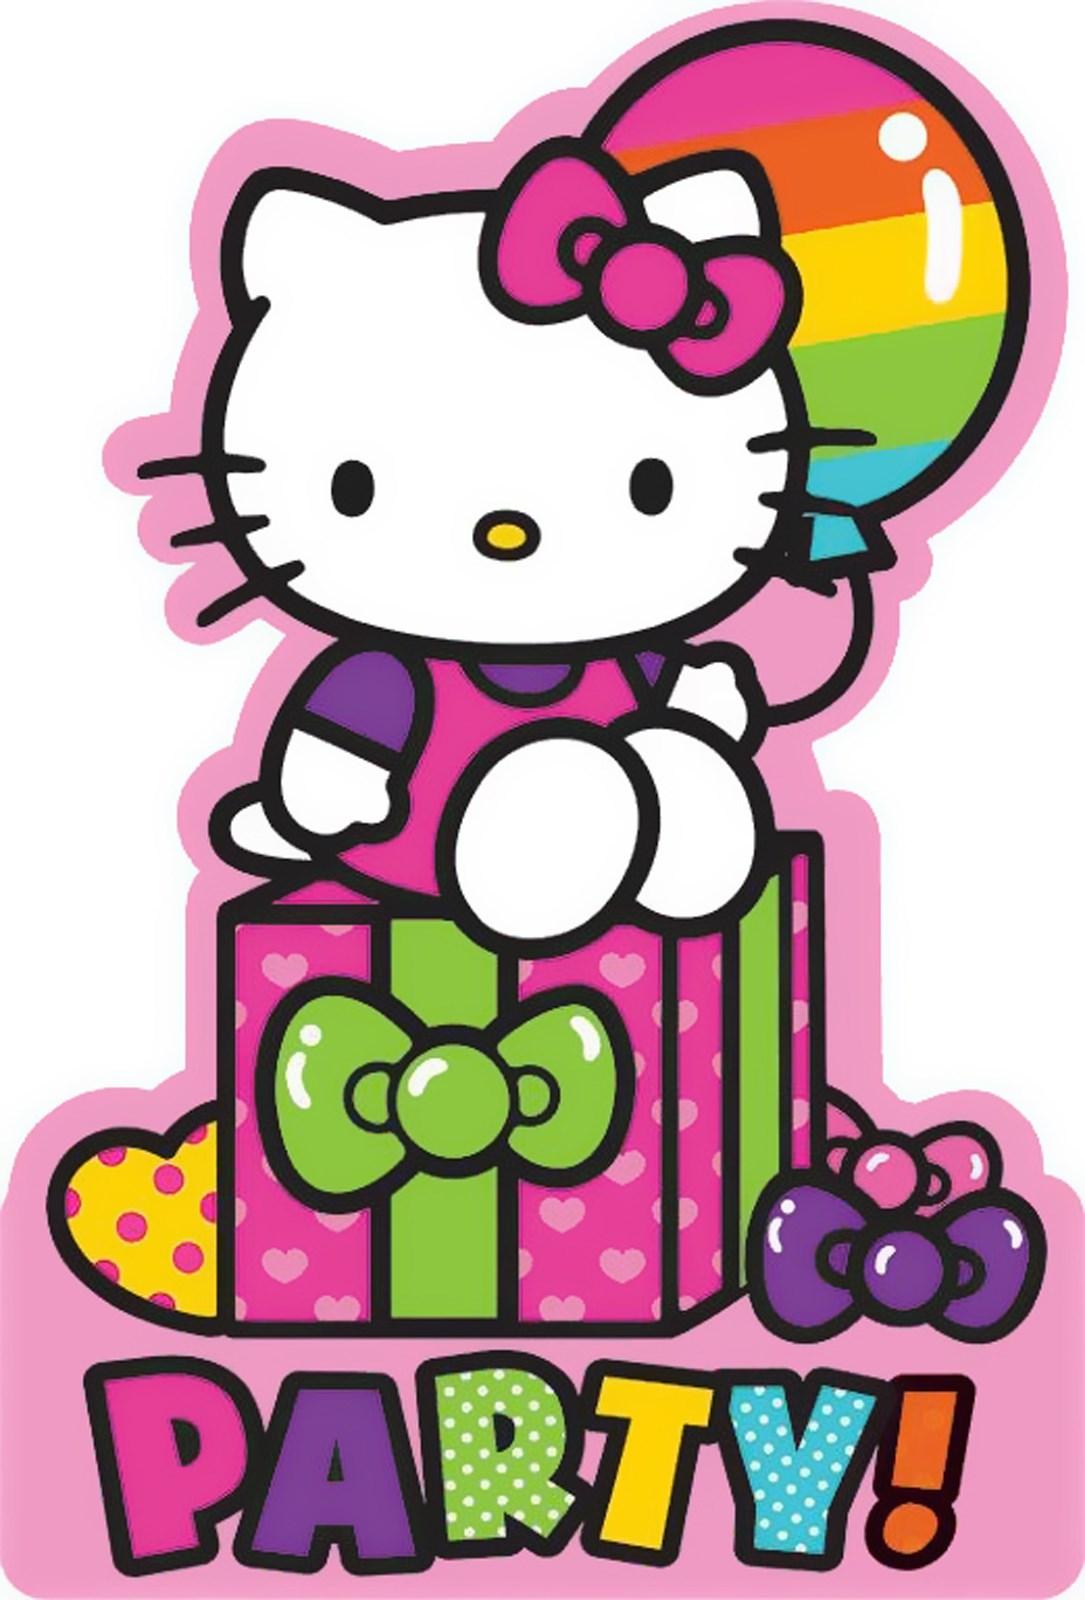 hello kitty rainbow invitations 8 birthdayexpress com default image hello kitty rainbow invitations 8